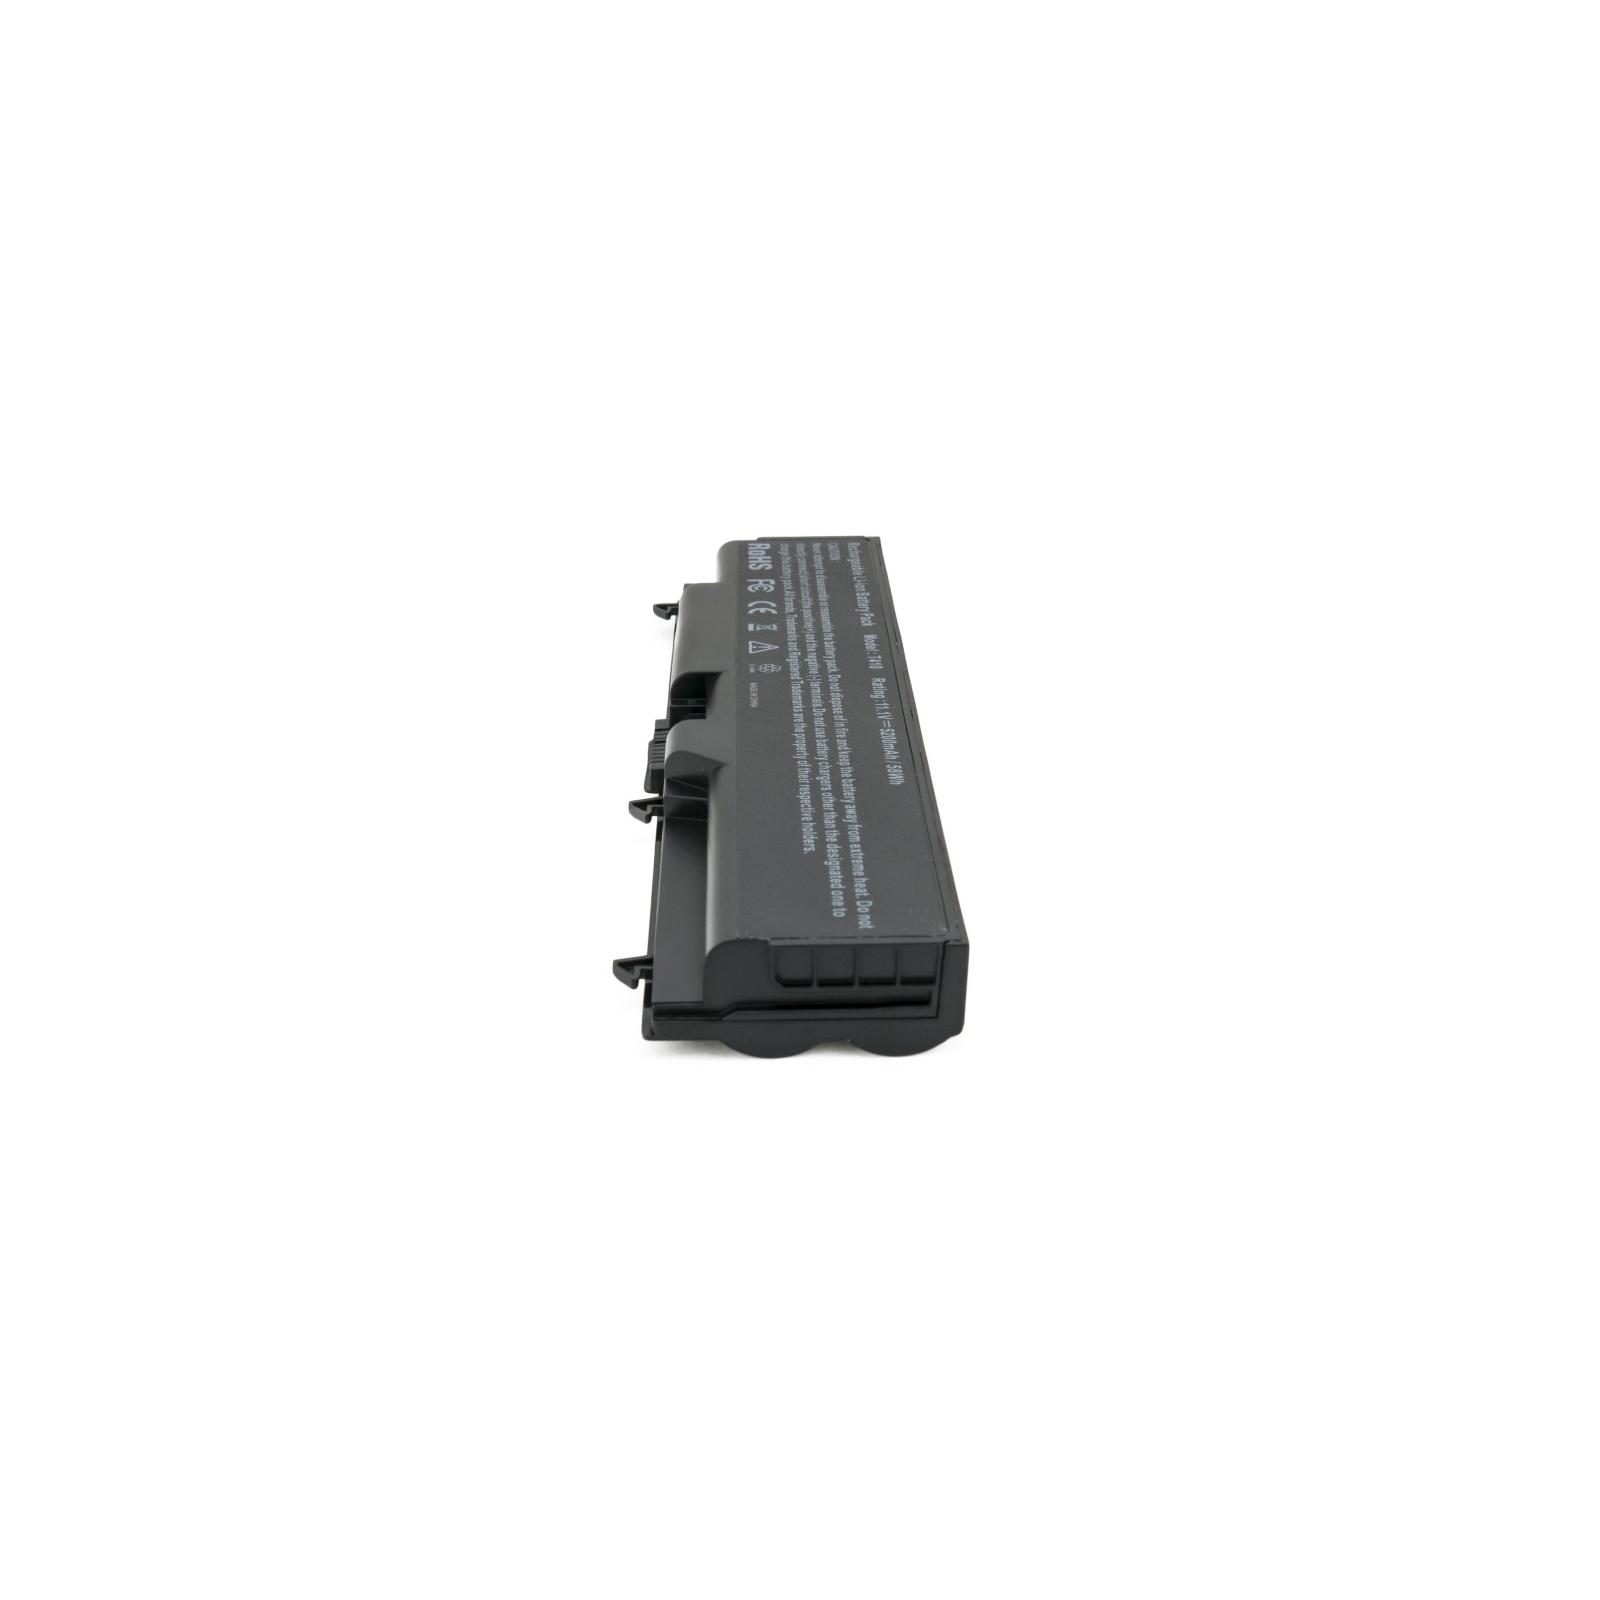 Аккумулятор для ноутбука Lenovo ThinkPad T410, 5200 mAh EXTRADIGITAL (BNL3950) изображение 5